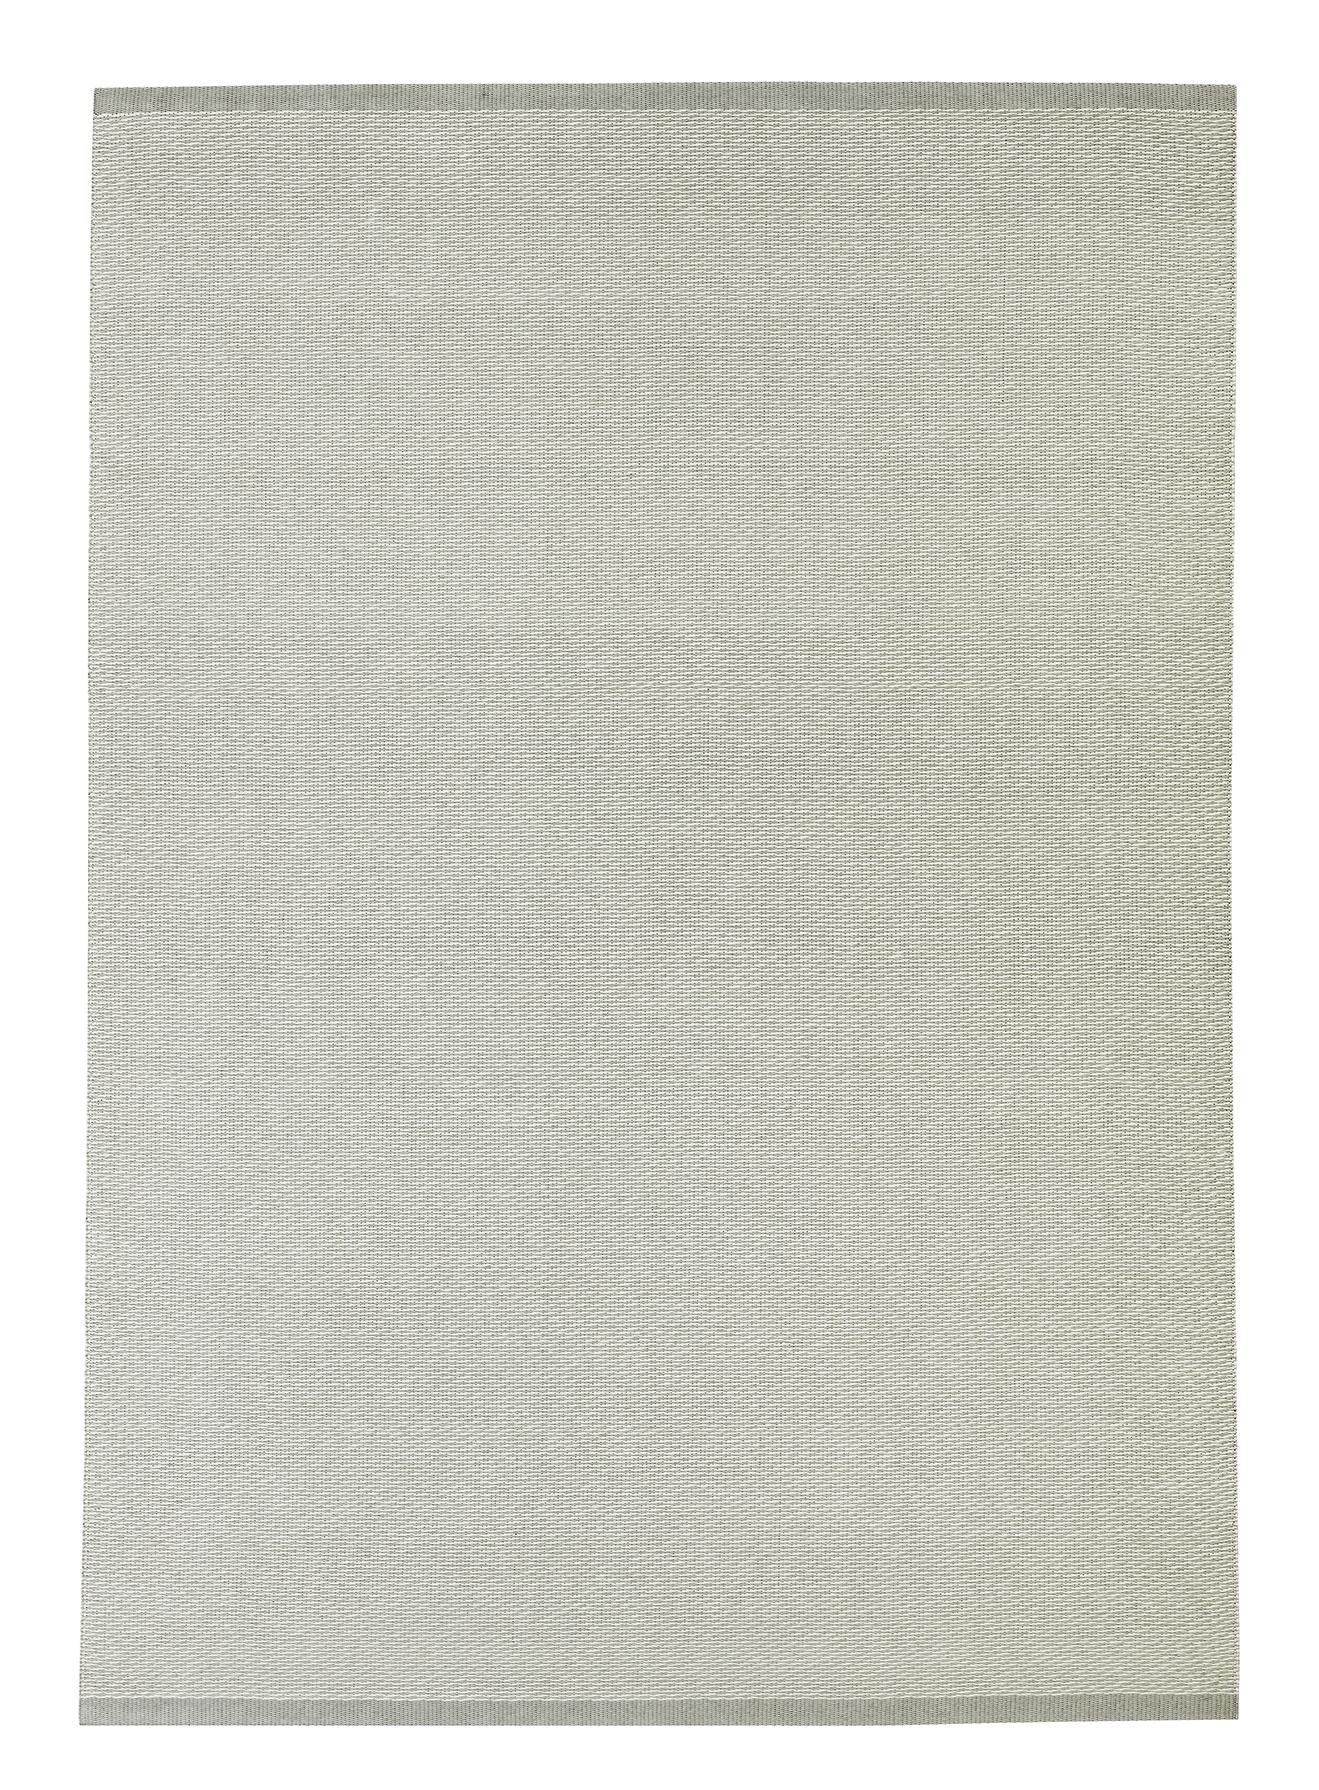 Betula 1627 Grey/Light Grey